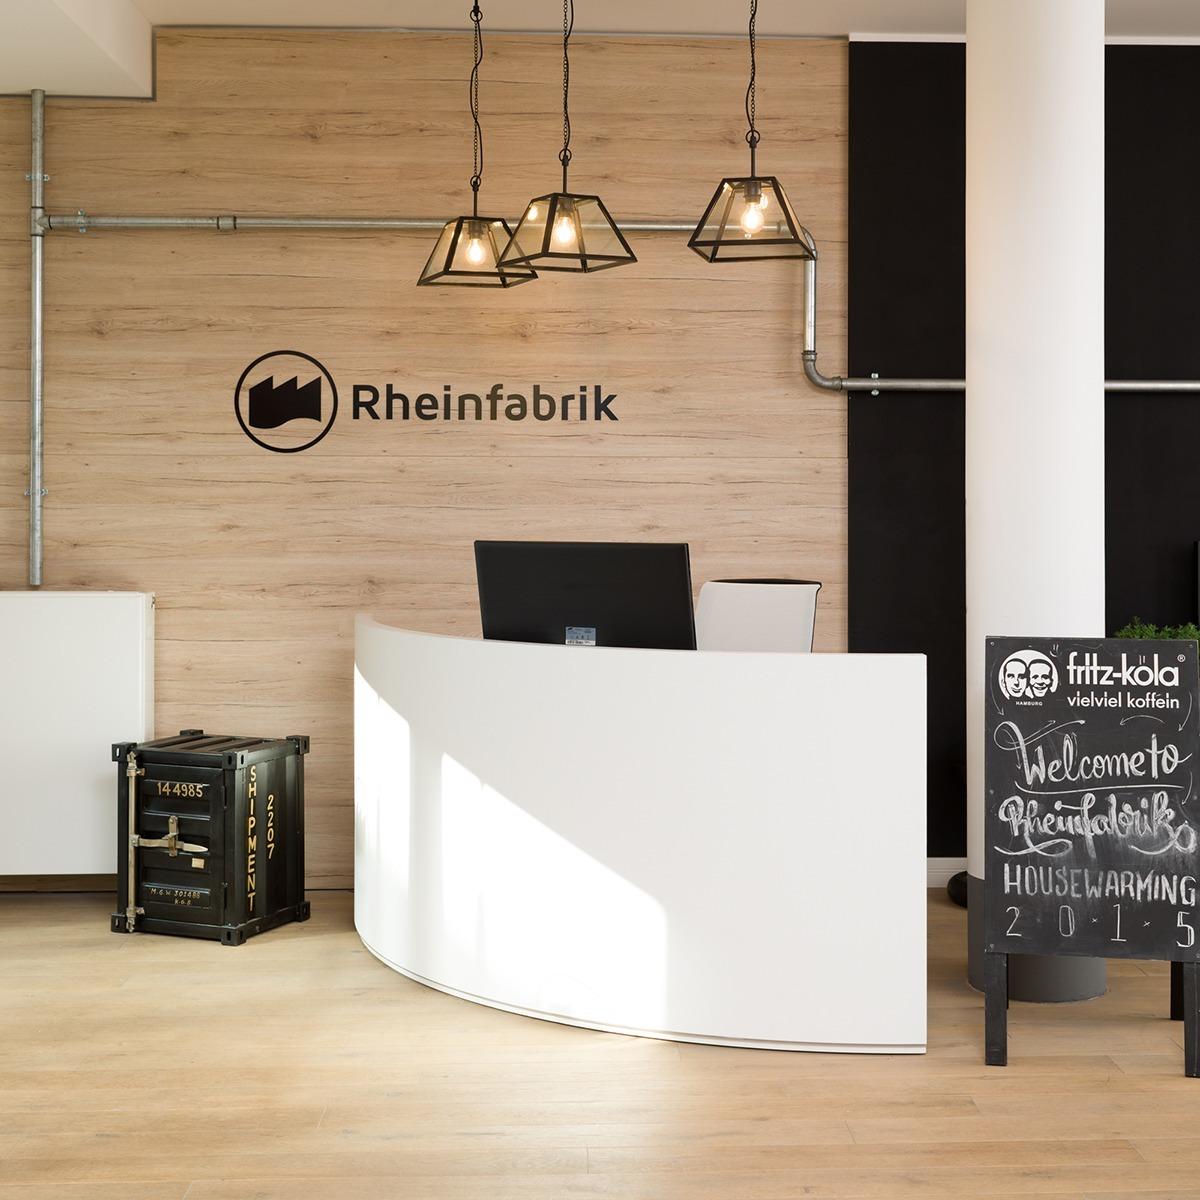 rheinfabrik-2